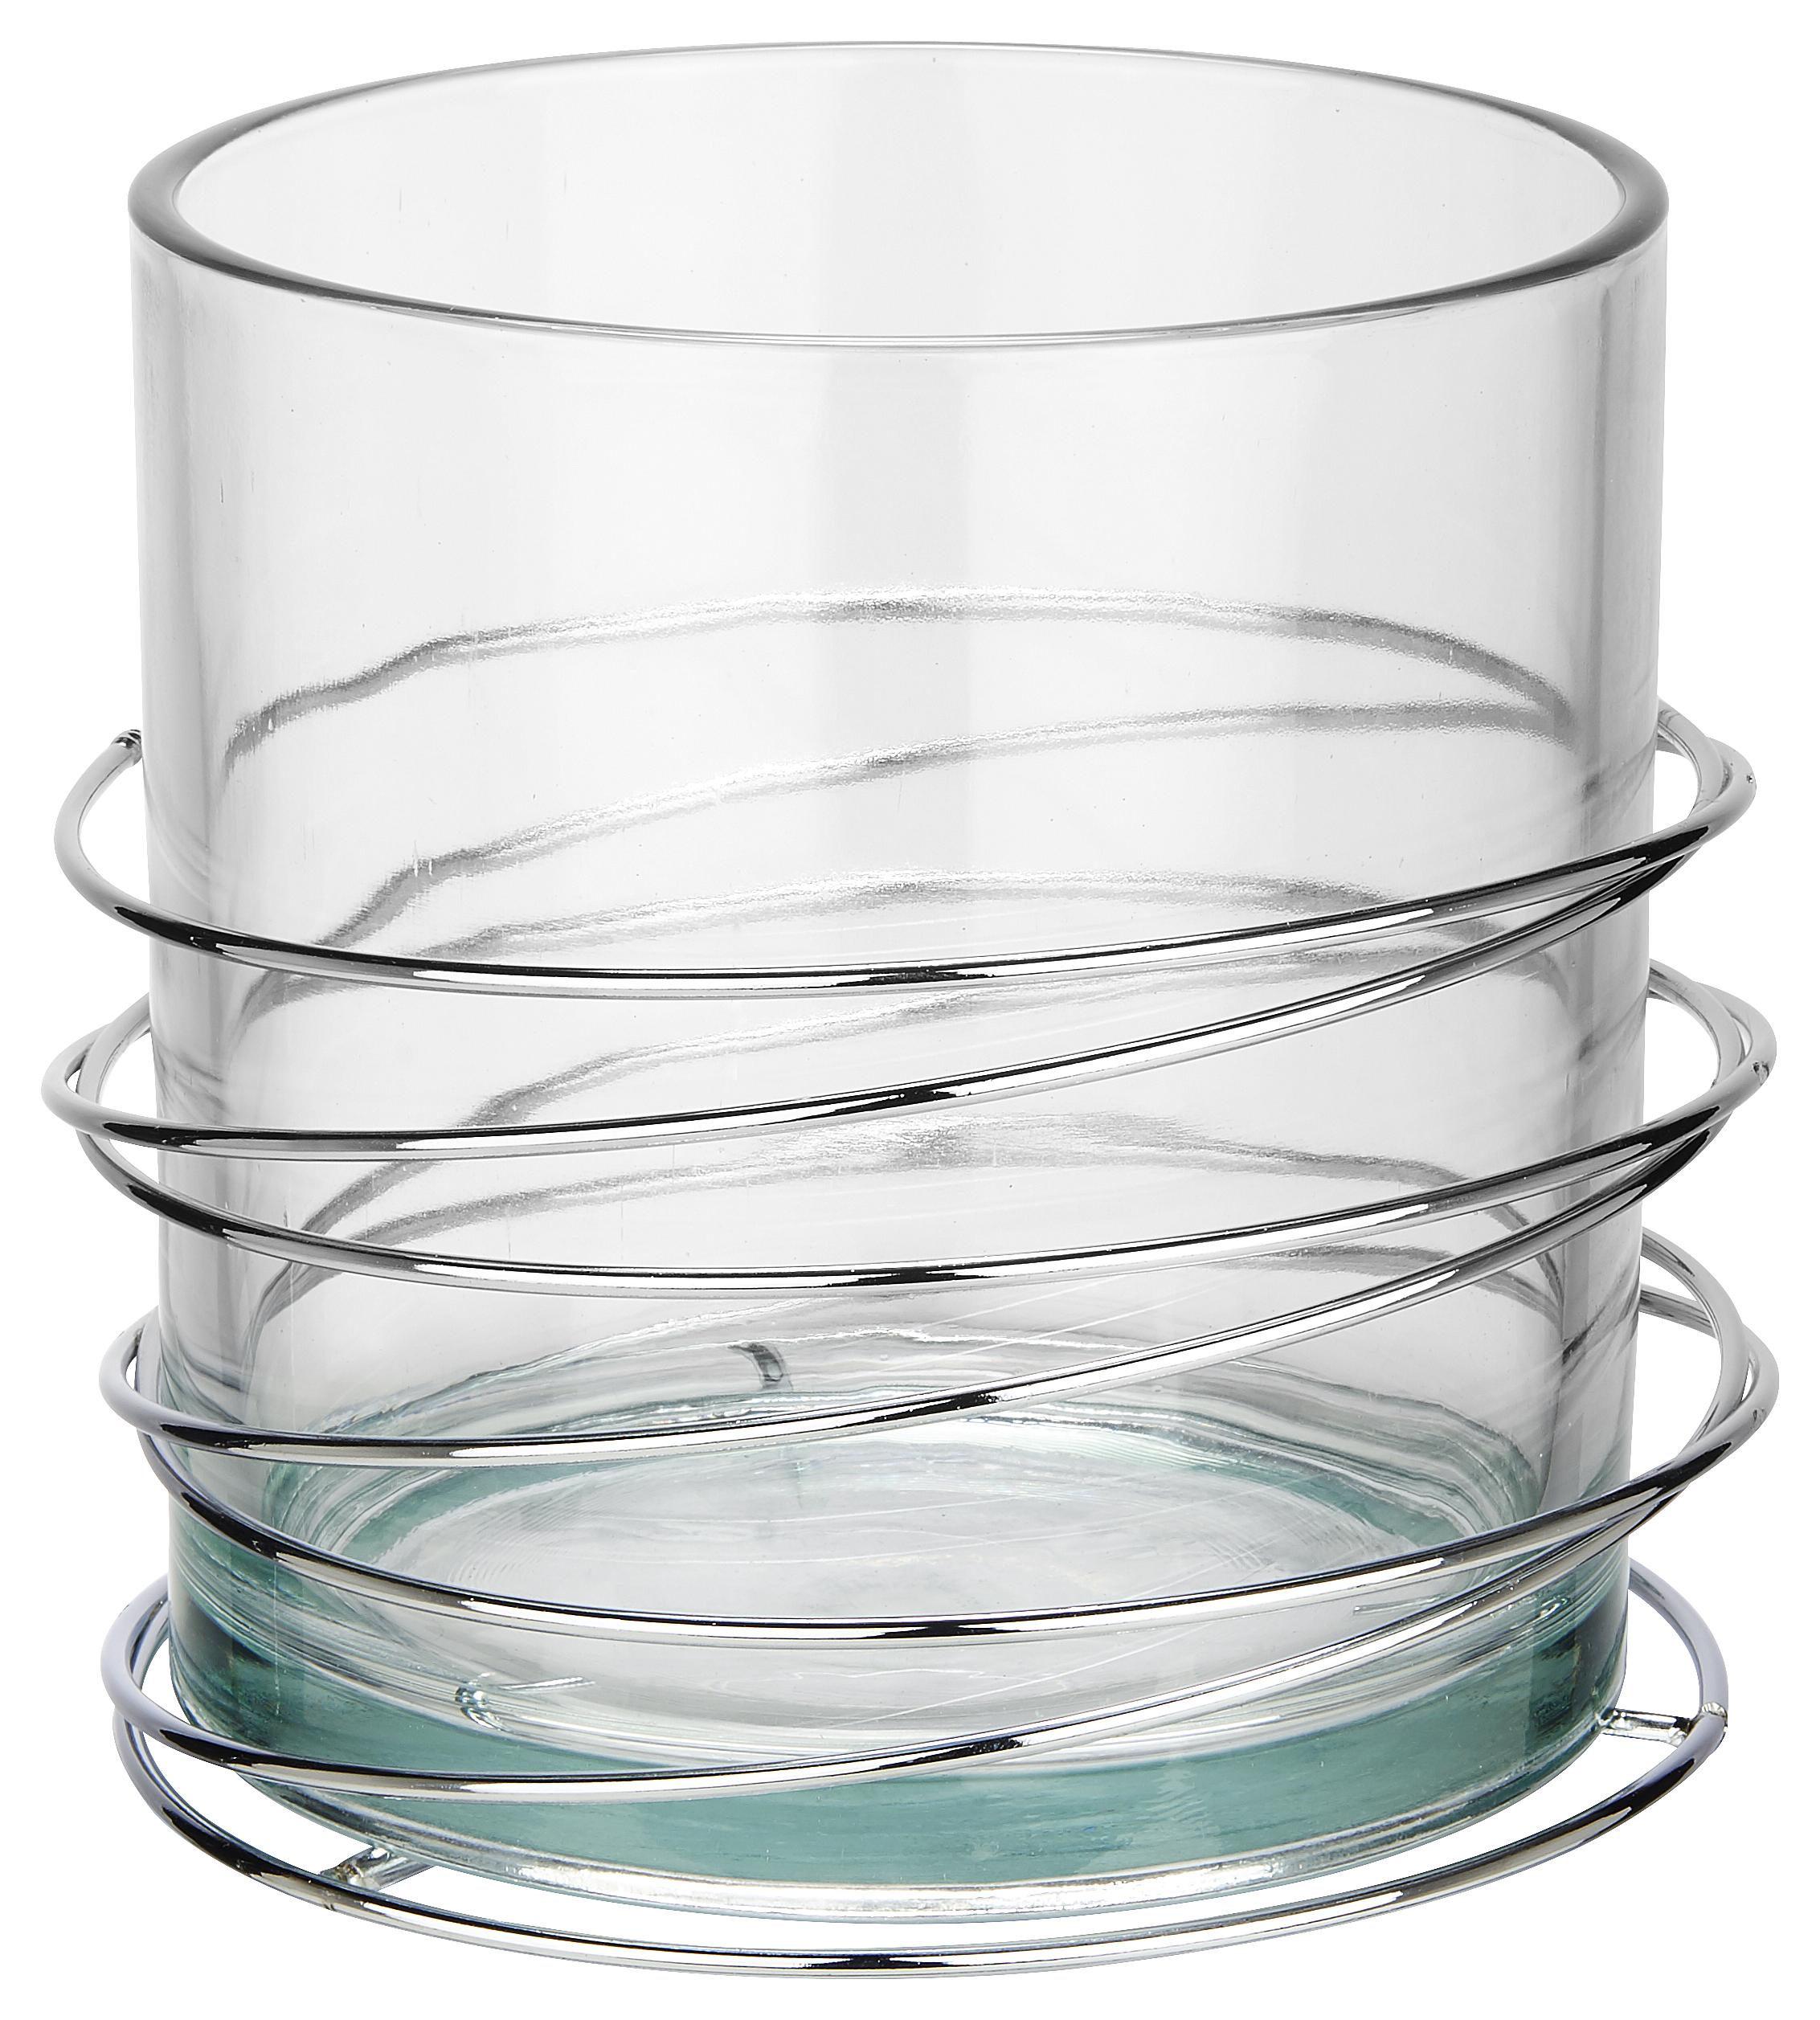 LJUSLYKTA - klar/silver, Design, metall/glas (16,8/15,4cm) - Ambia Home